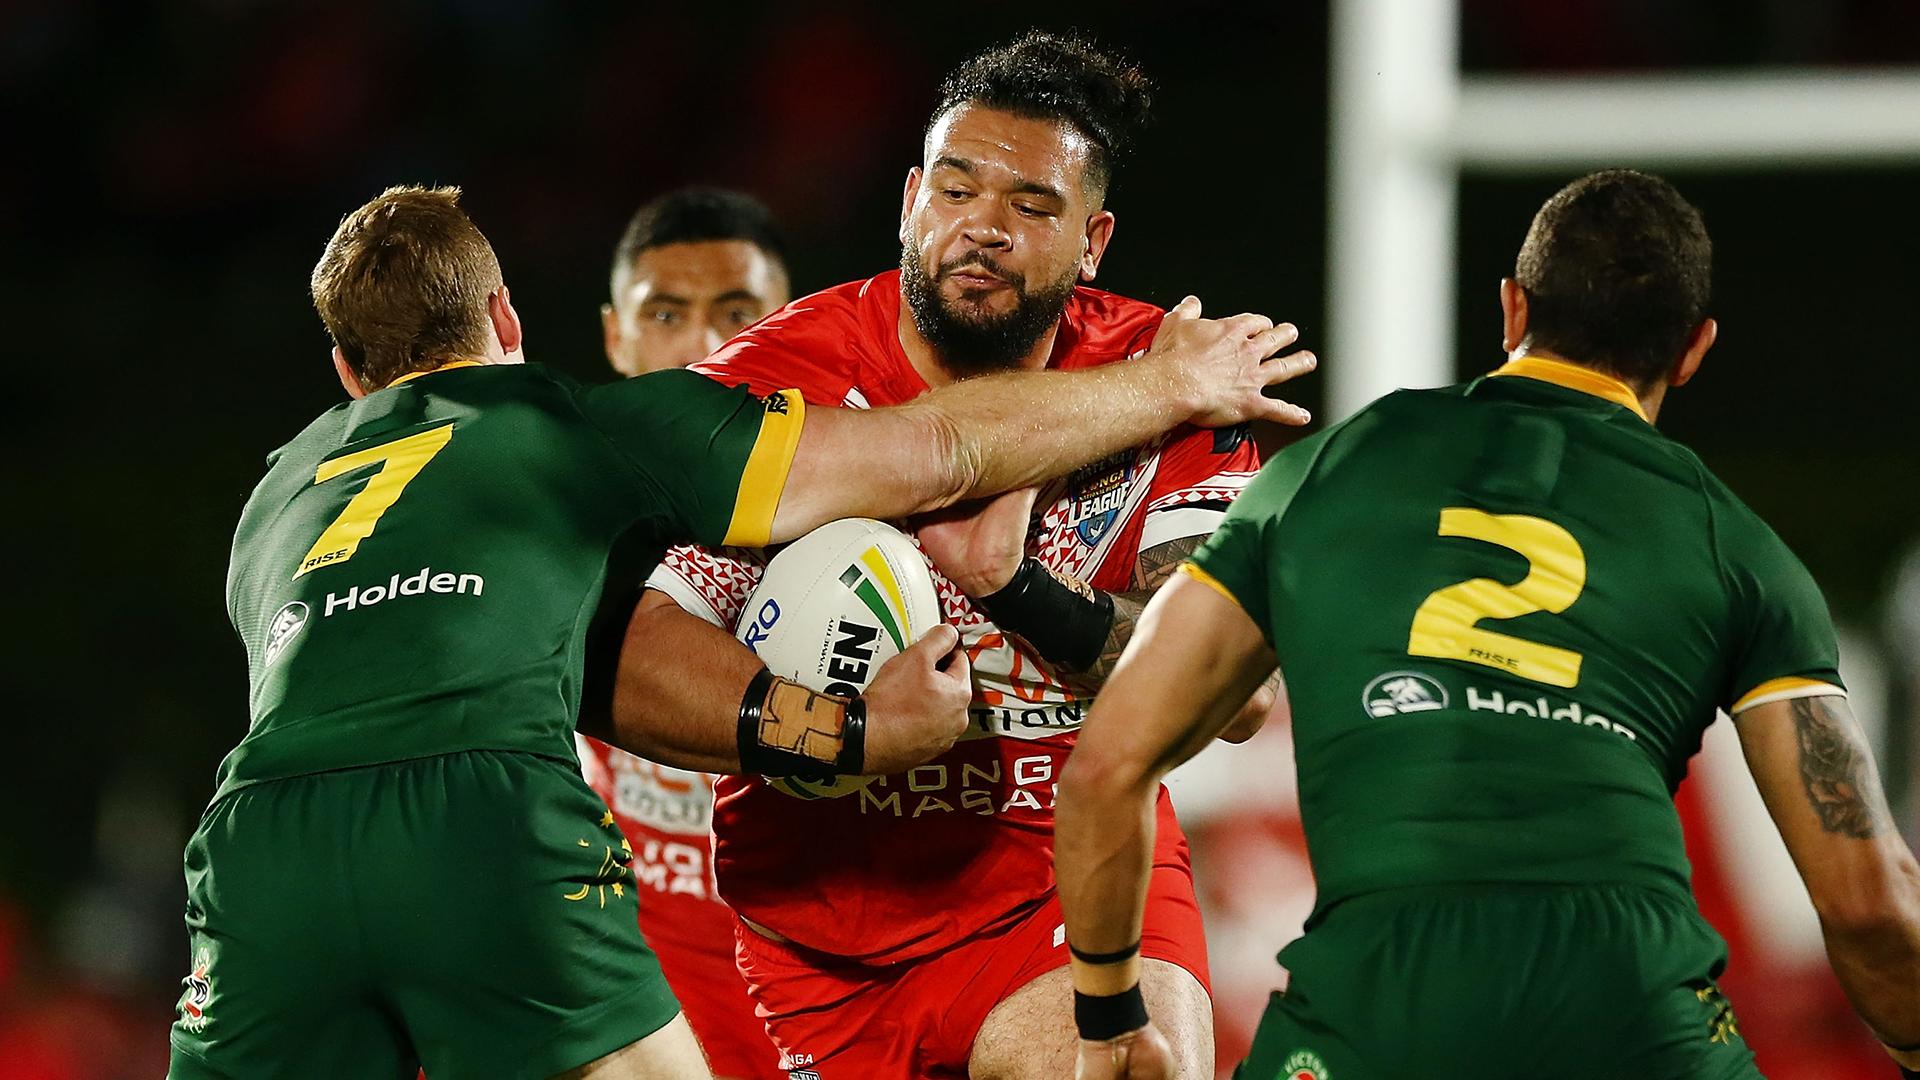 Australia vs Tonga Invitational: Rugby League fans want Ben Murdoch-Masila 'back in the NRL'